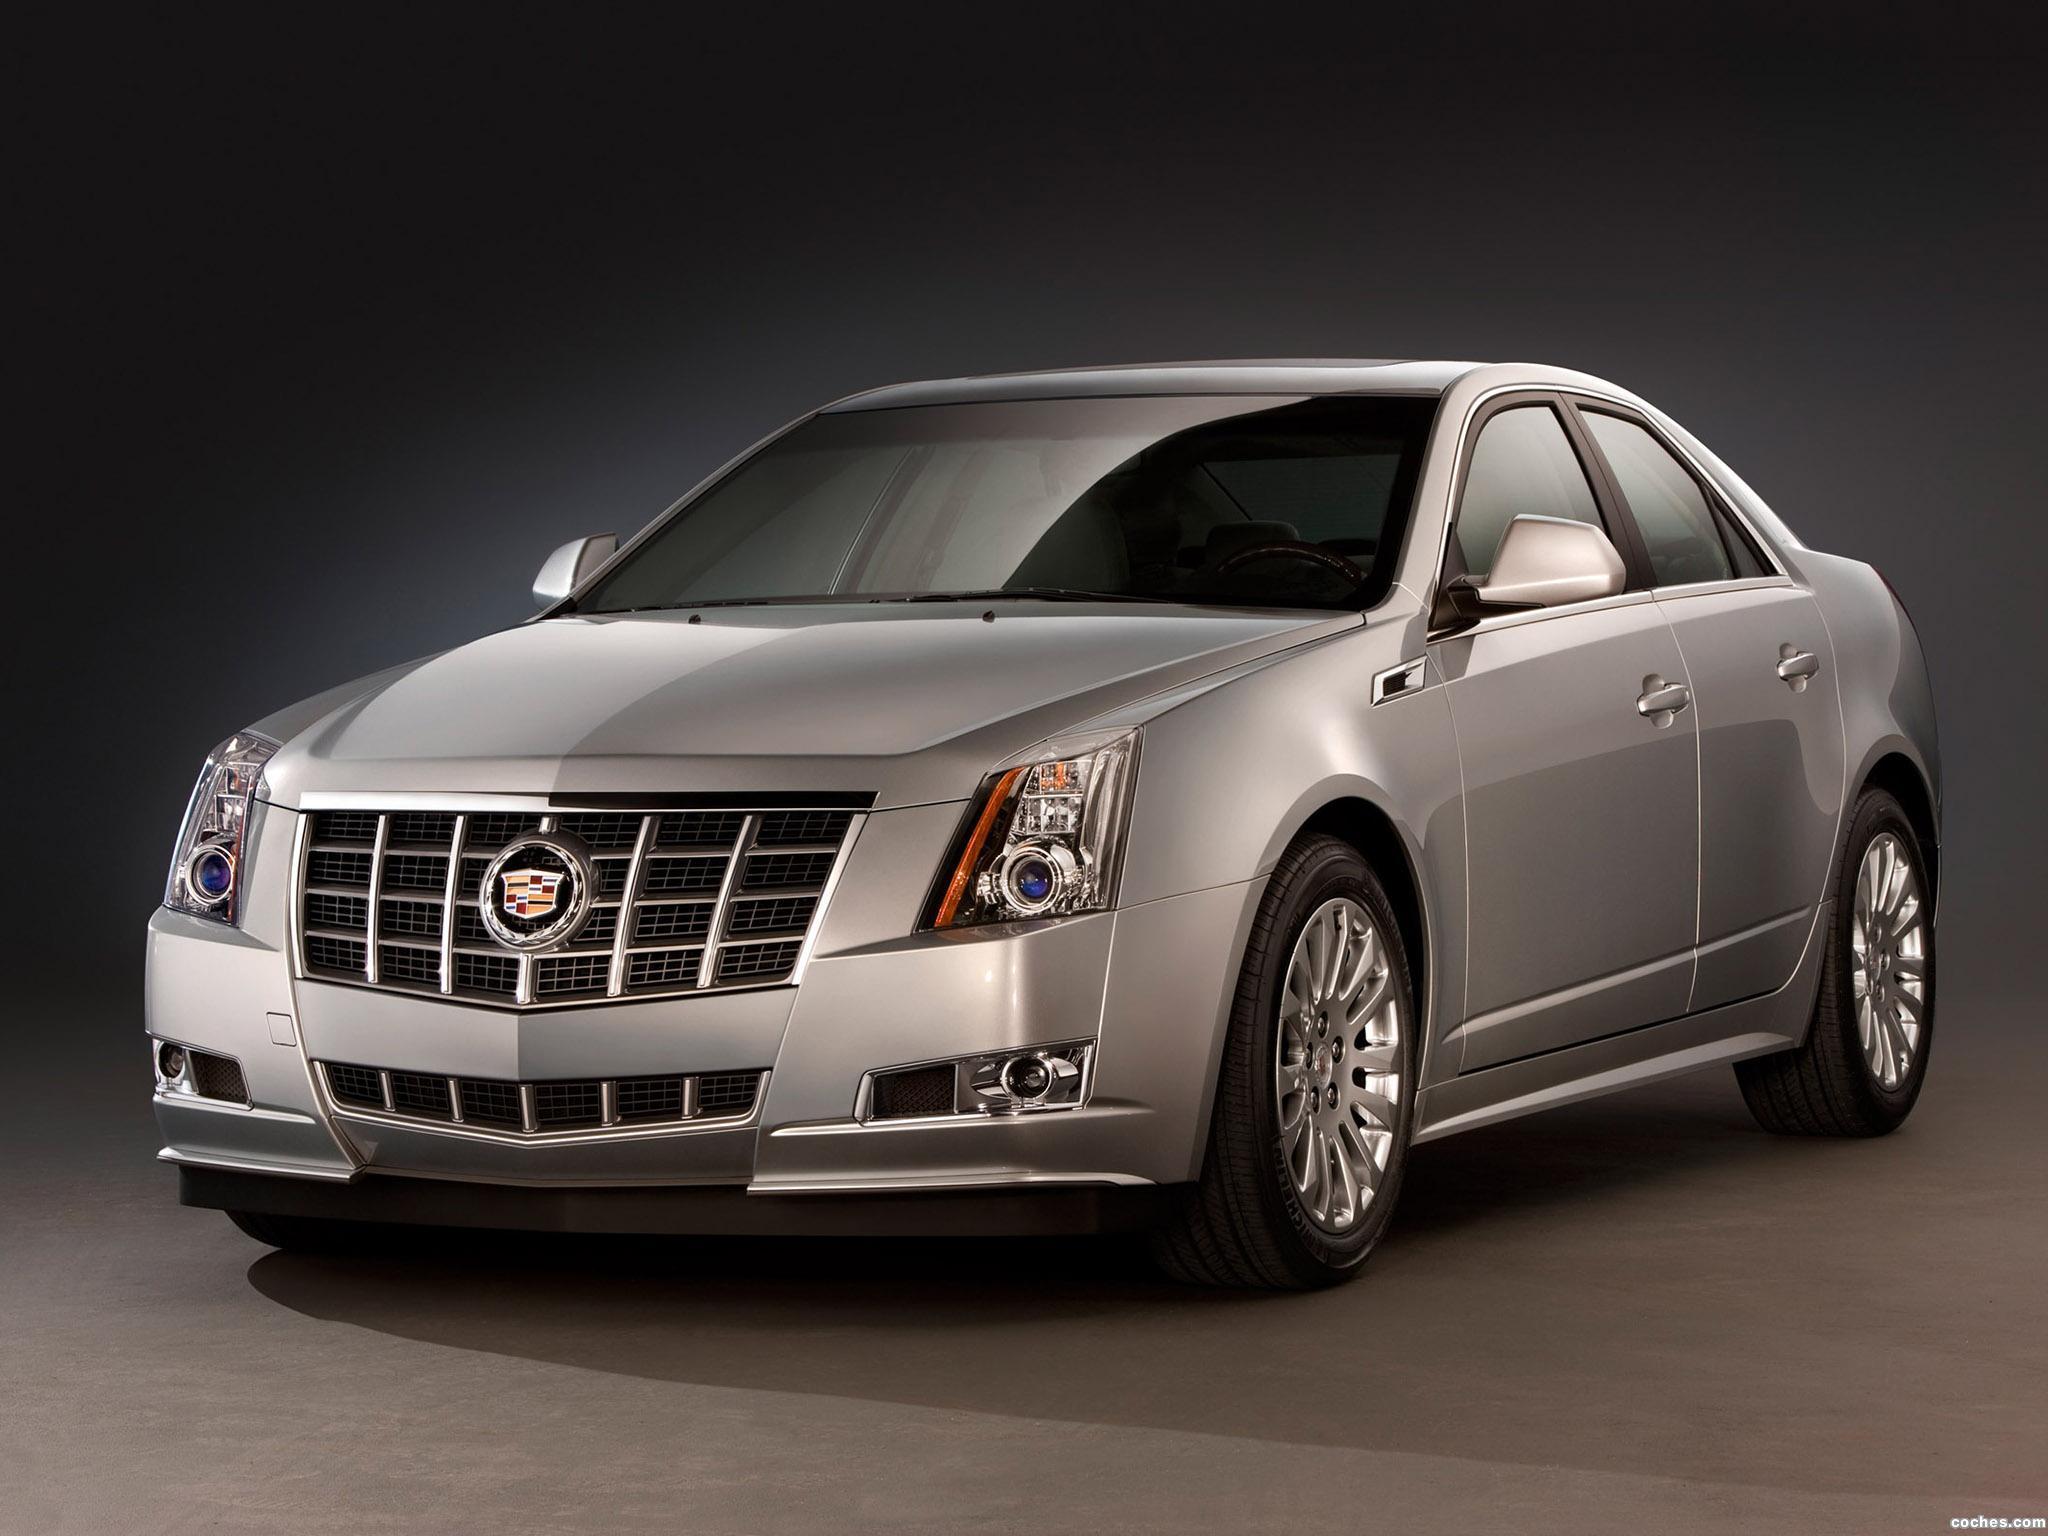 Foto 0 de Cadillac CTS Sedan 2011